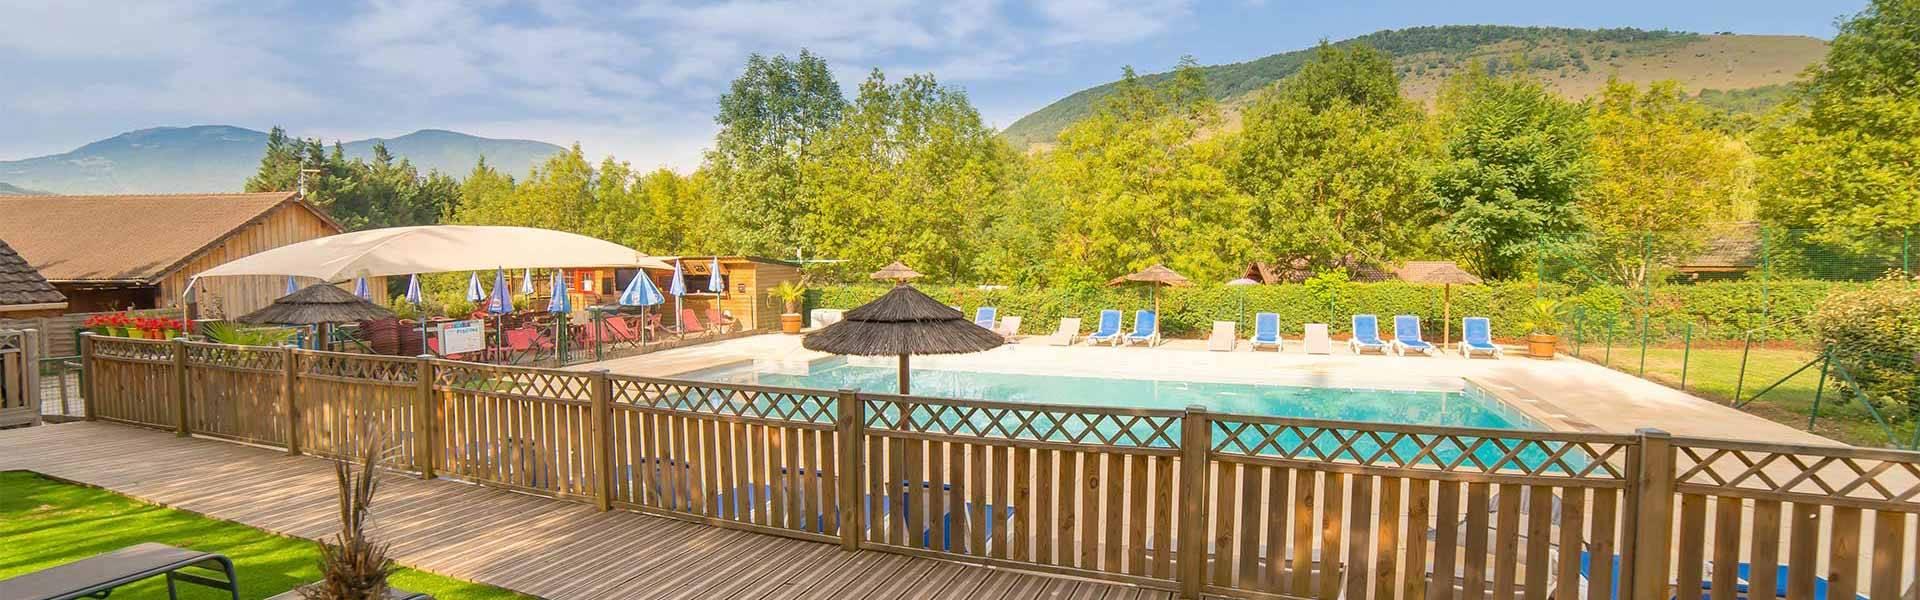 piscine camping massif belledonne lac de laffrey